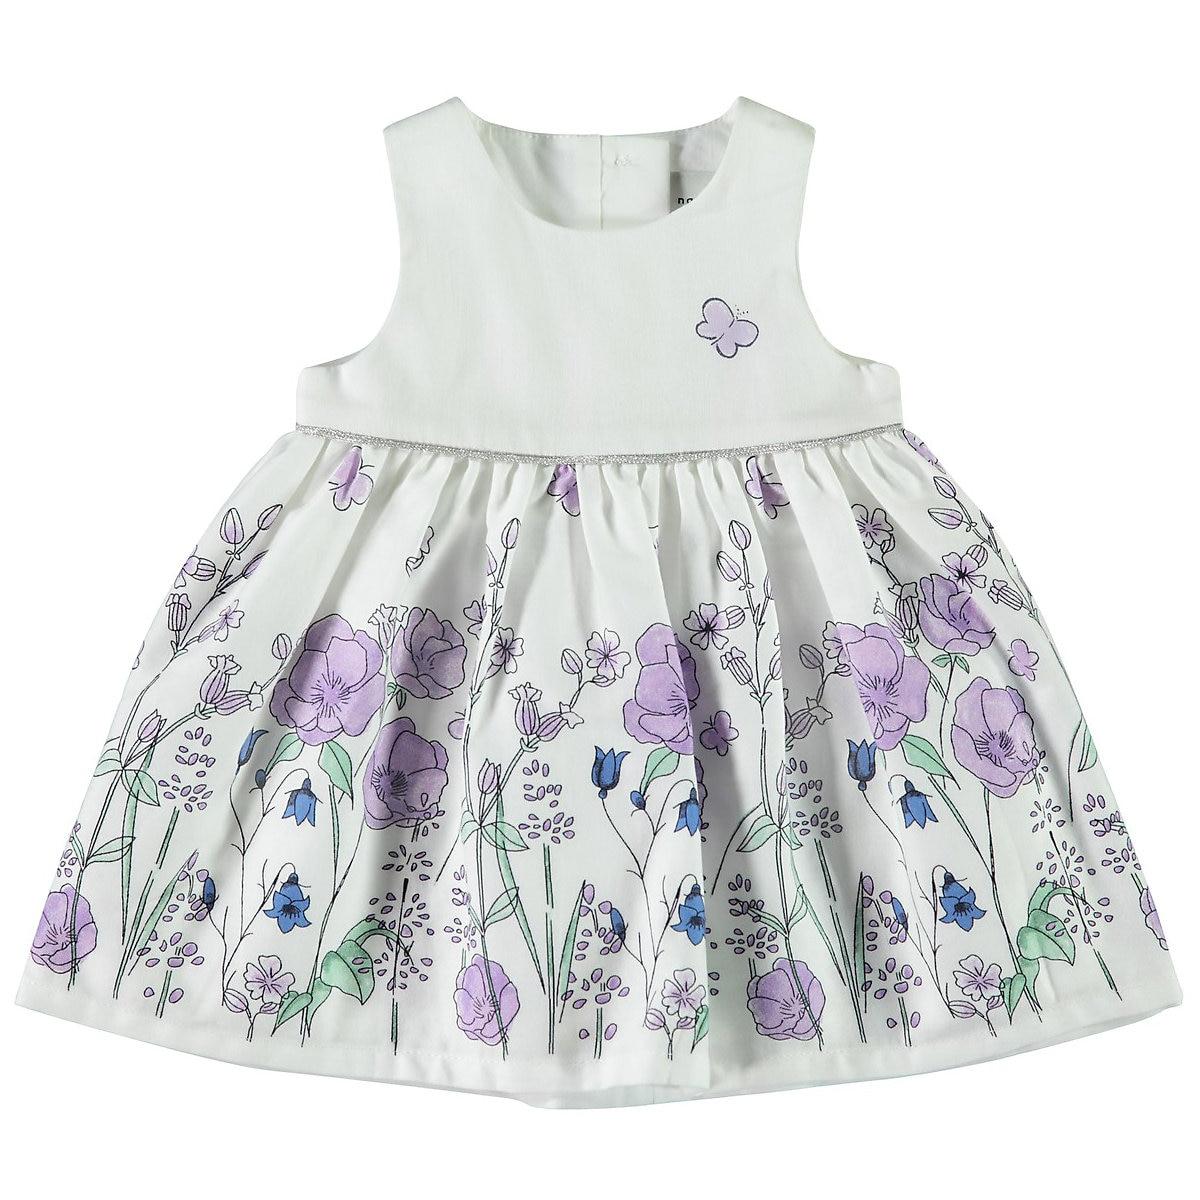 Фото - NAME IT Dresses 10623580 dress for girls baby clothing name it dresses 10626724 dress for girls baby clothing